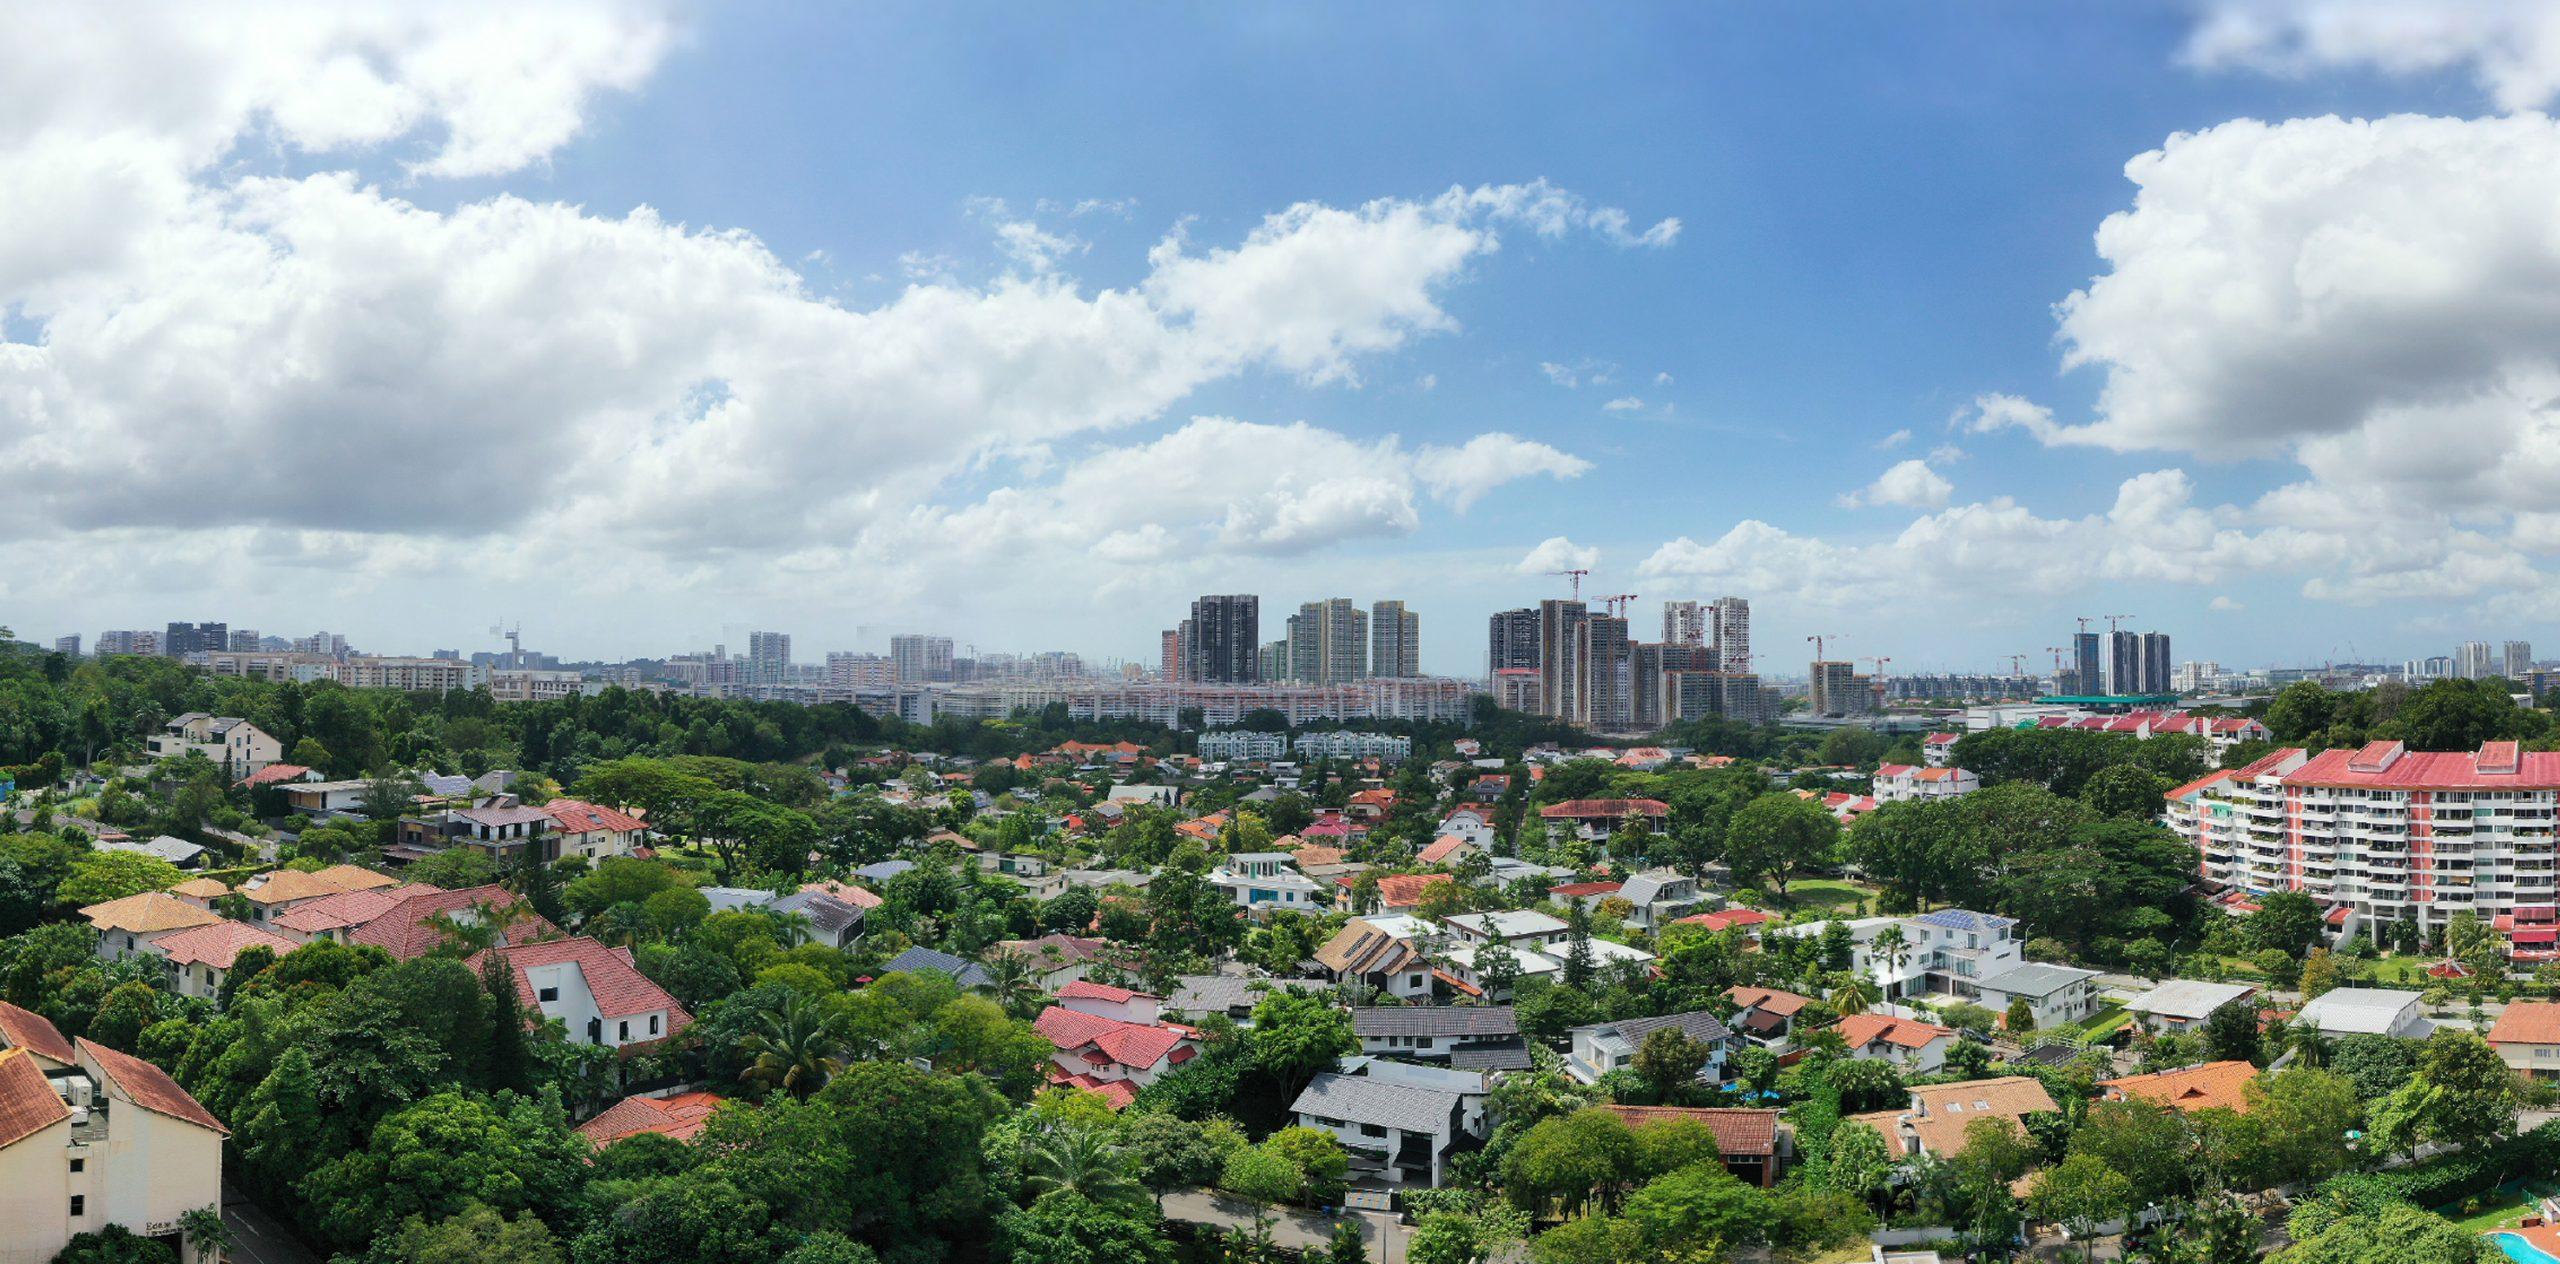 KI Residences – Drone View on the South – Ki Residences